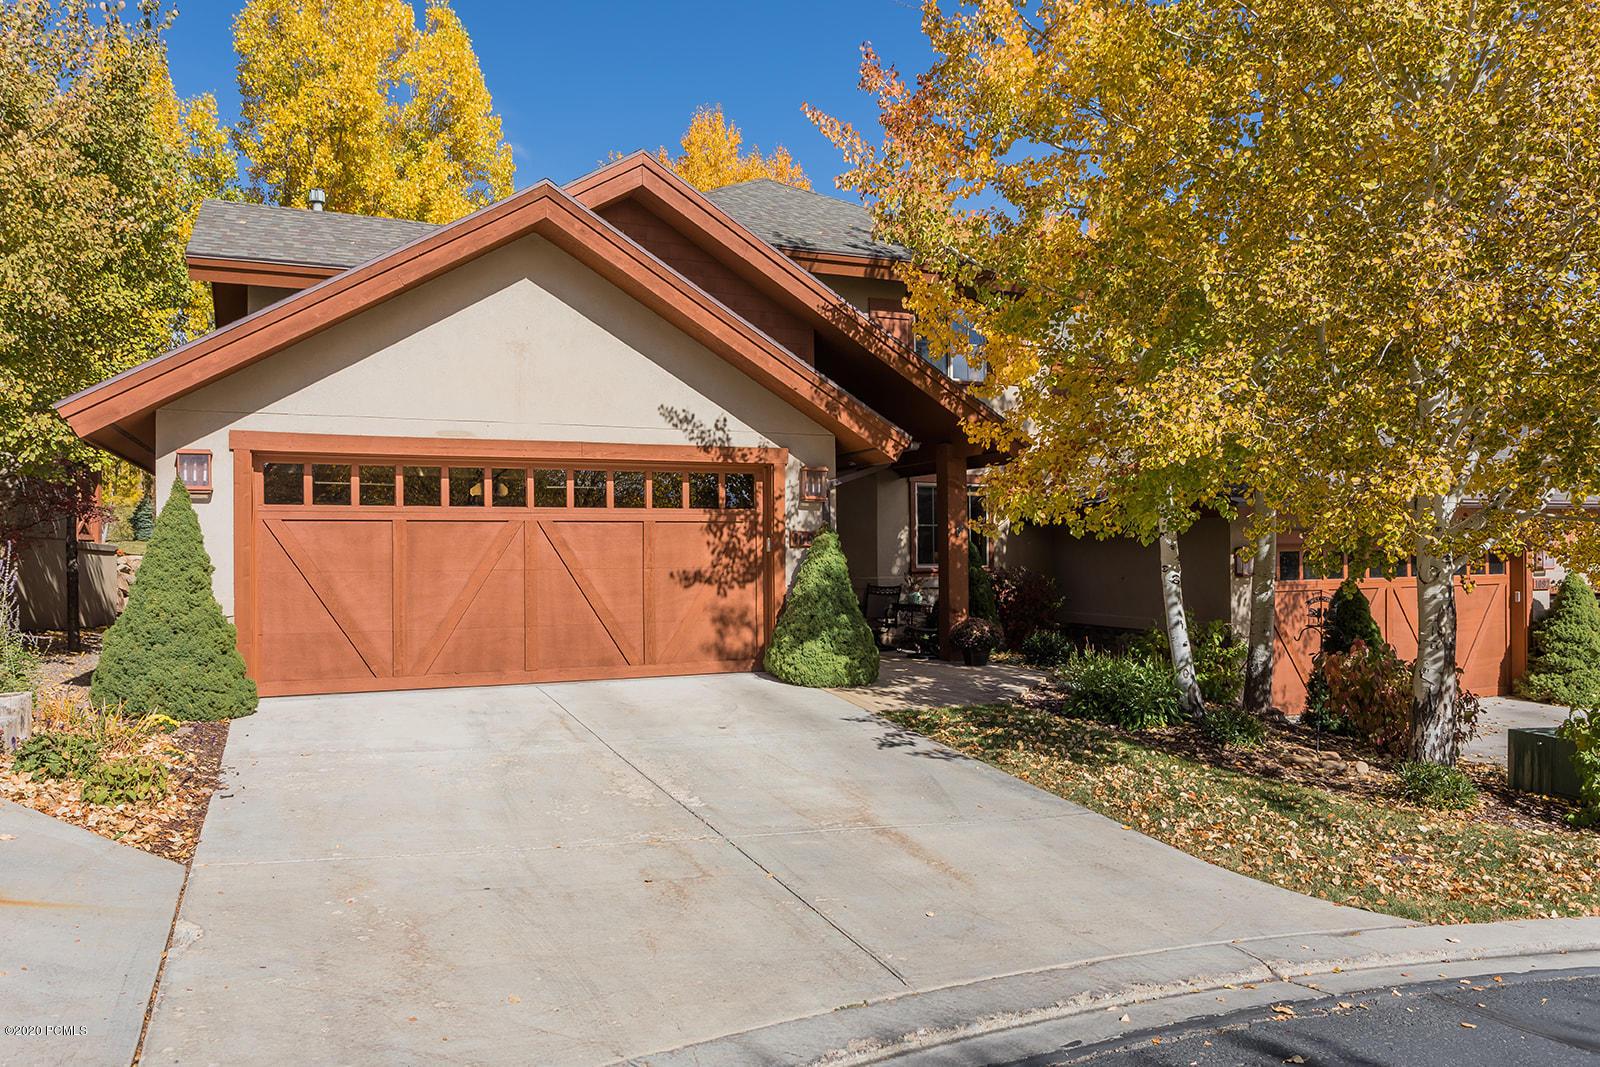 1094 Turnberry Ct Court, Midway, Utah 84049, 3 Bedrooms Bedrooms, ,4 BathroomsBathrooms,Condominium,For Sale,Turnberry Ct,12004136